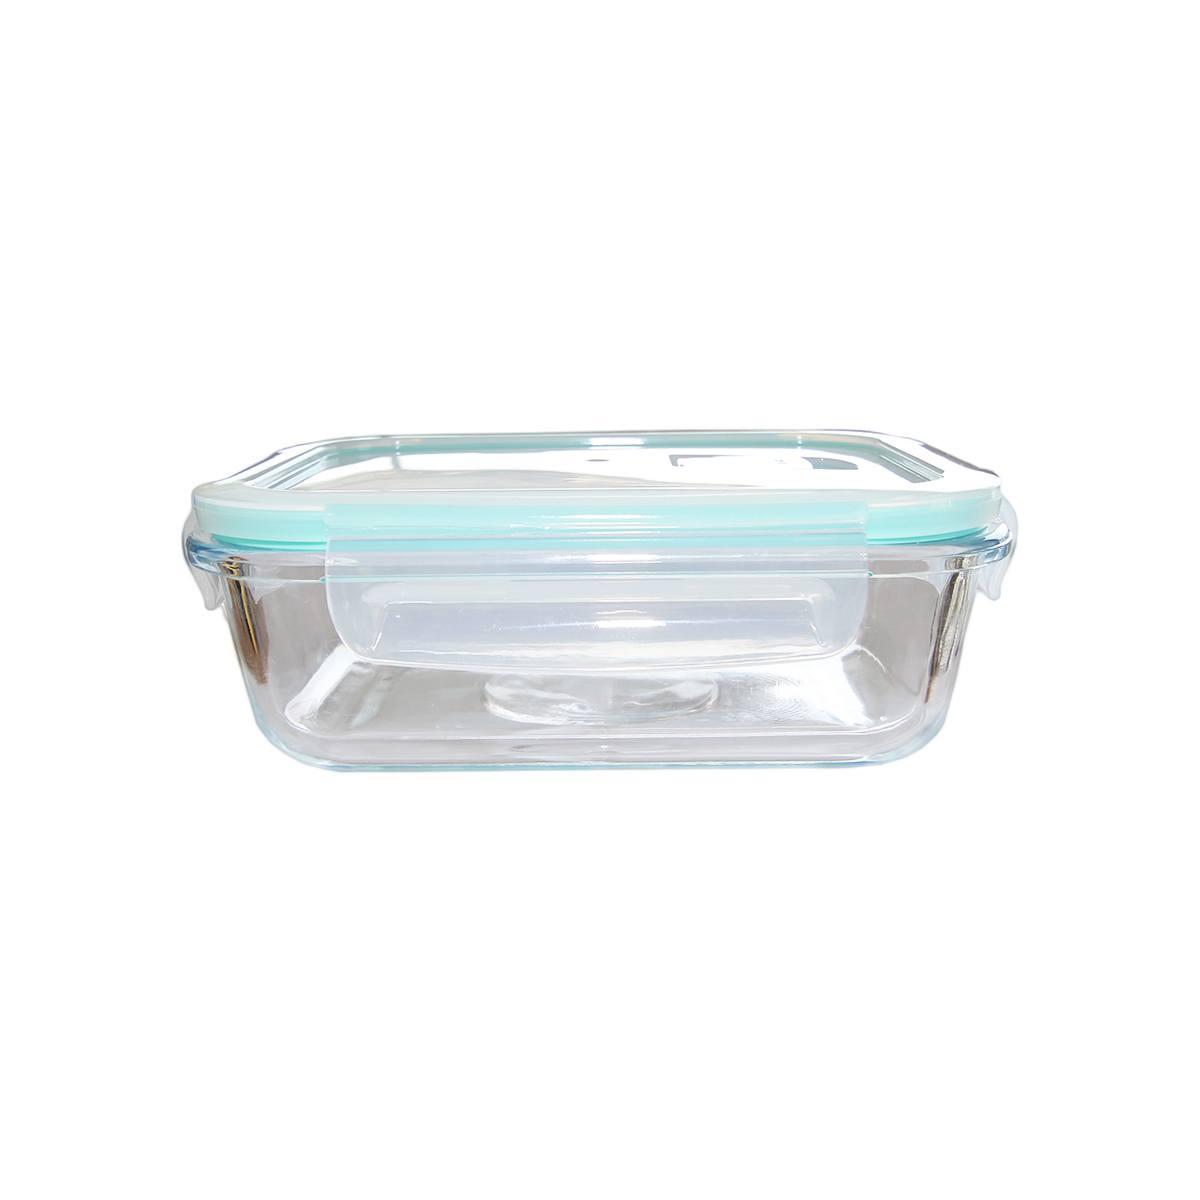 Pote hermético vidro transparente tampa plástica 640ml Lyor